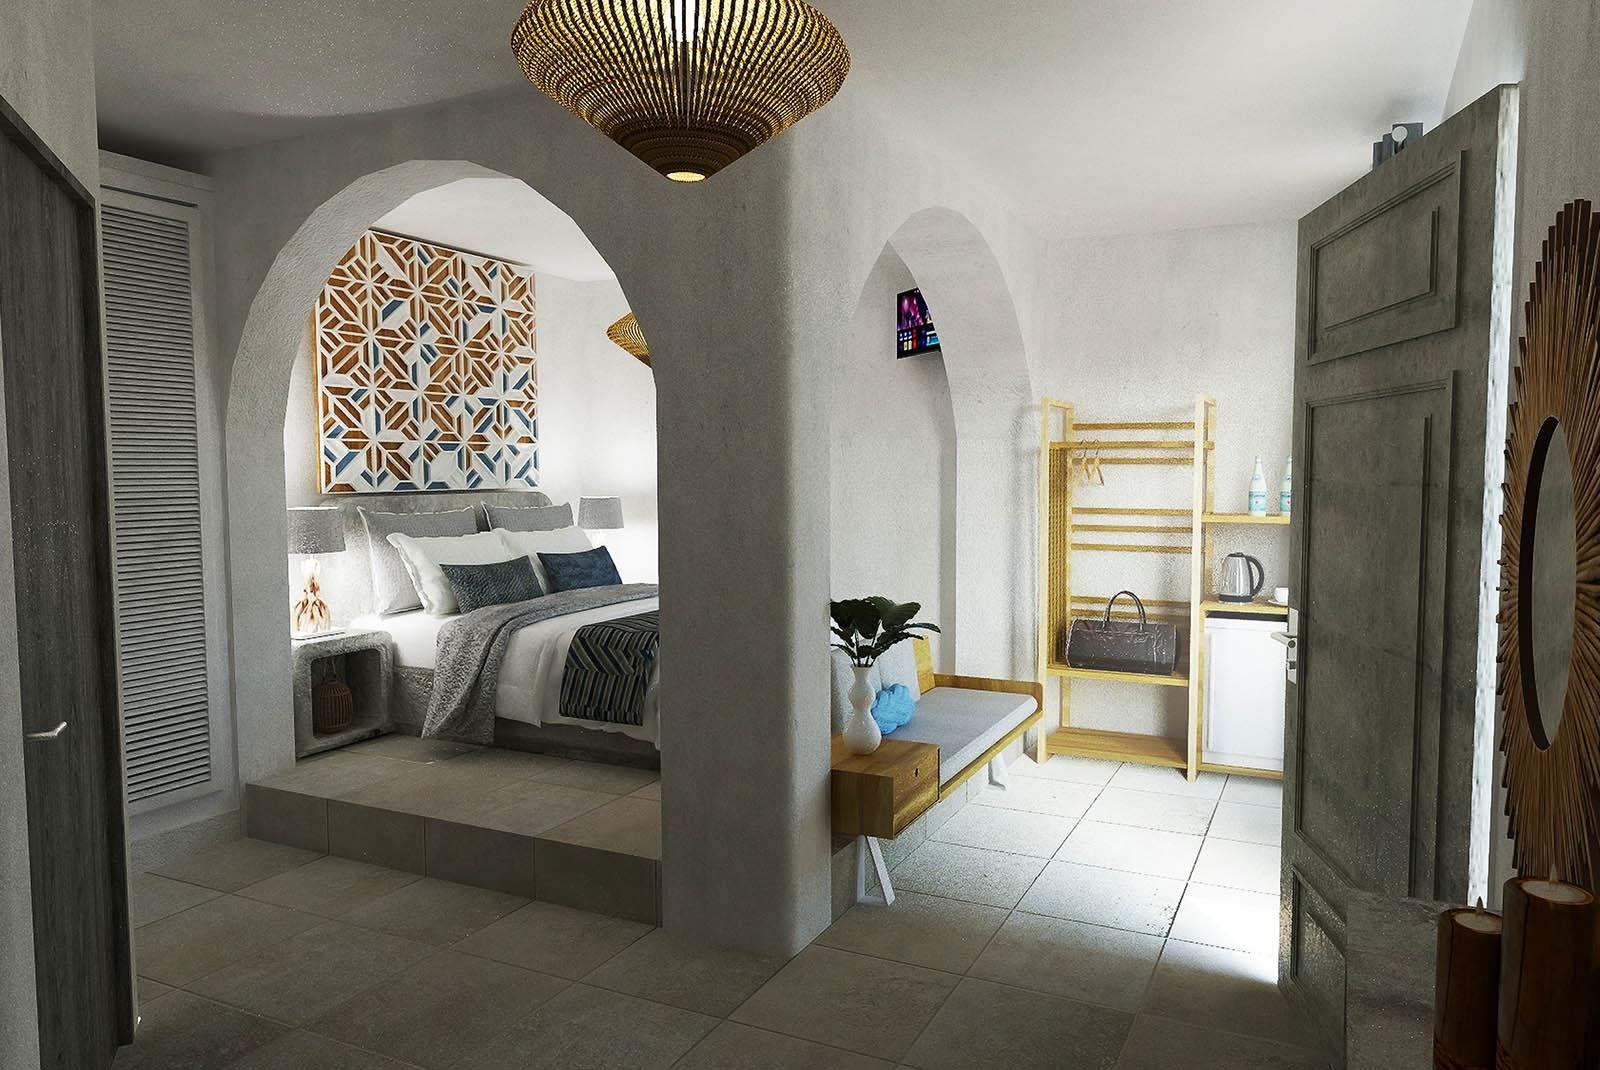 santorini hotel - Gizis Exclusive Santorini Greece